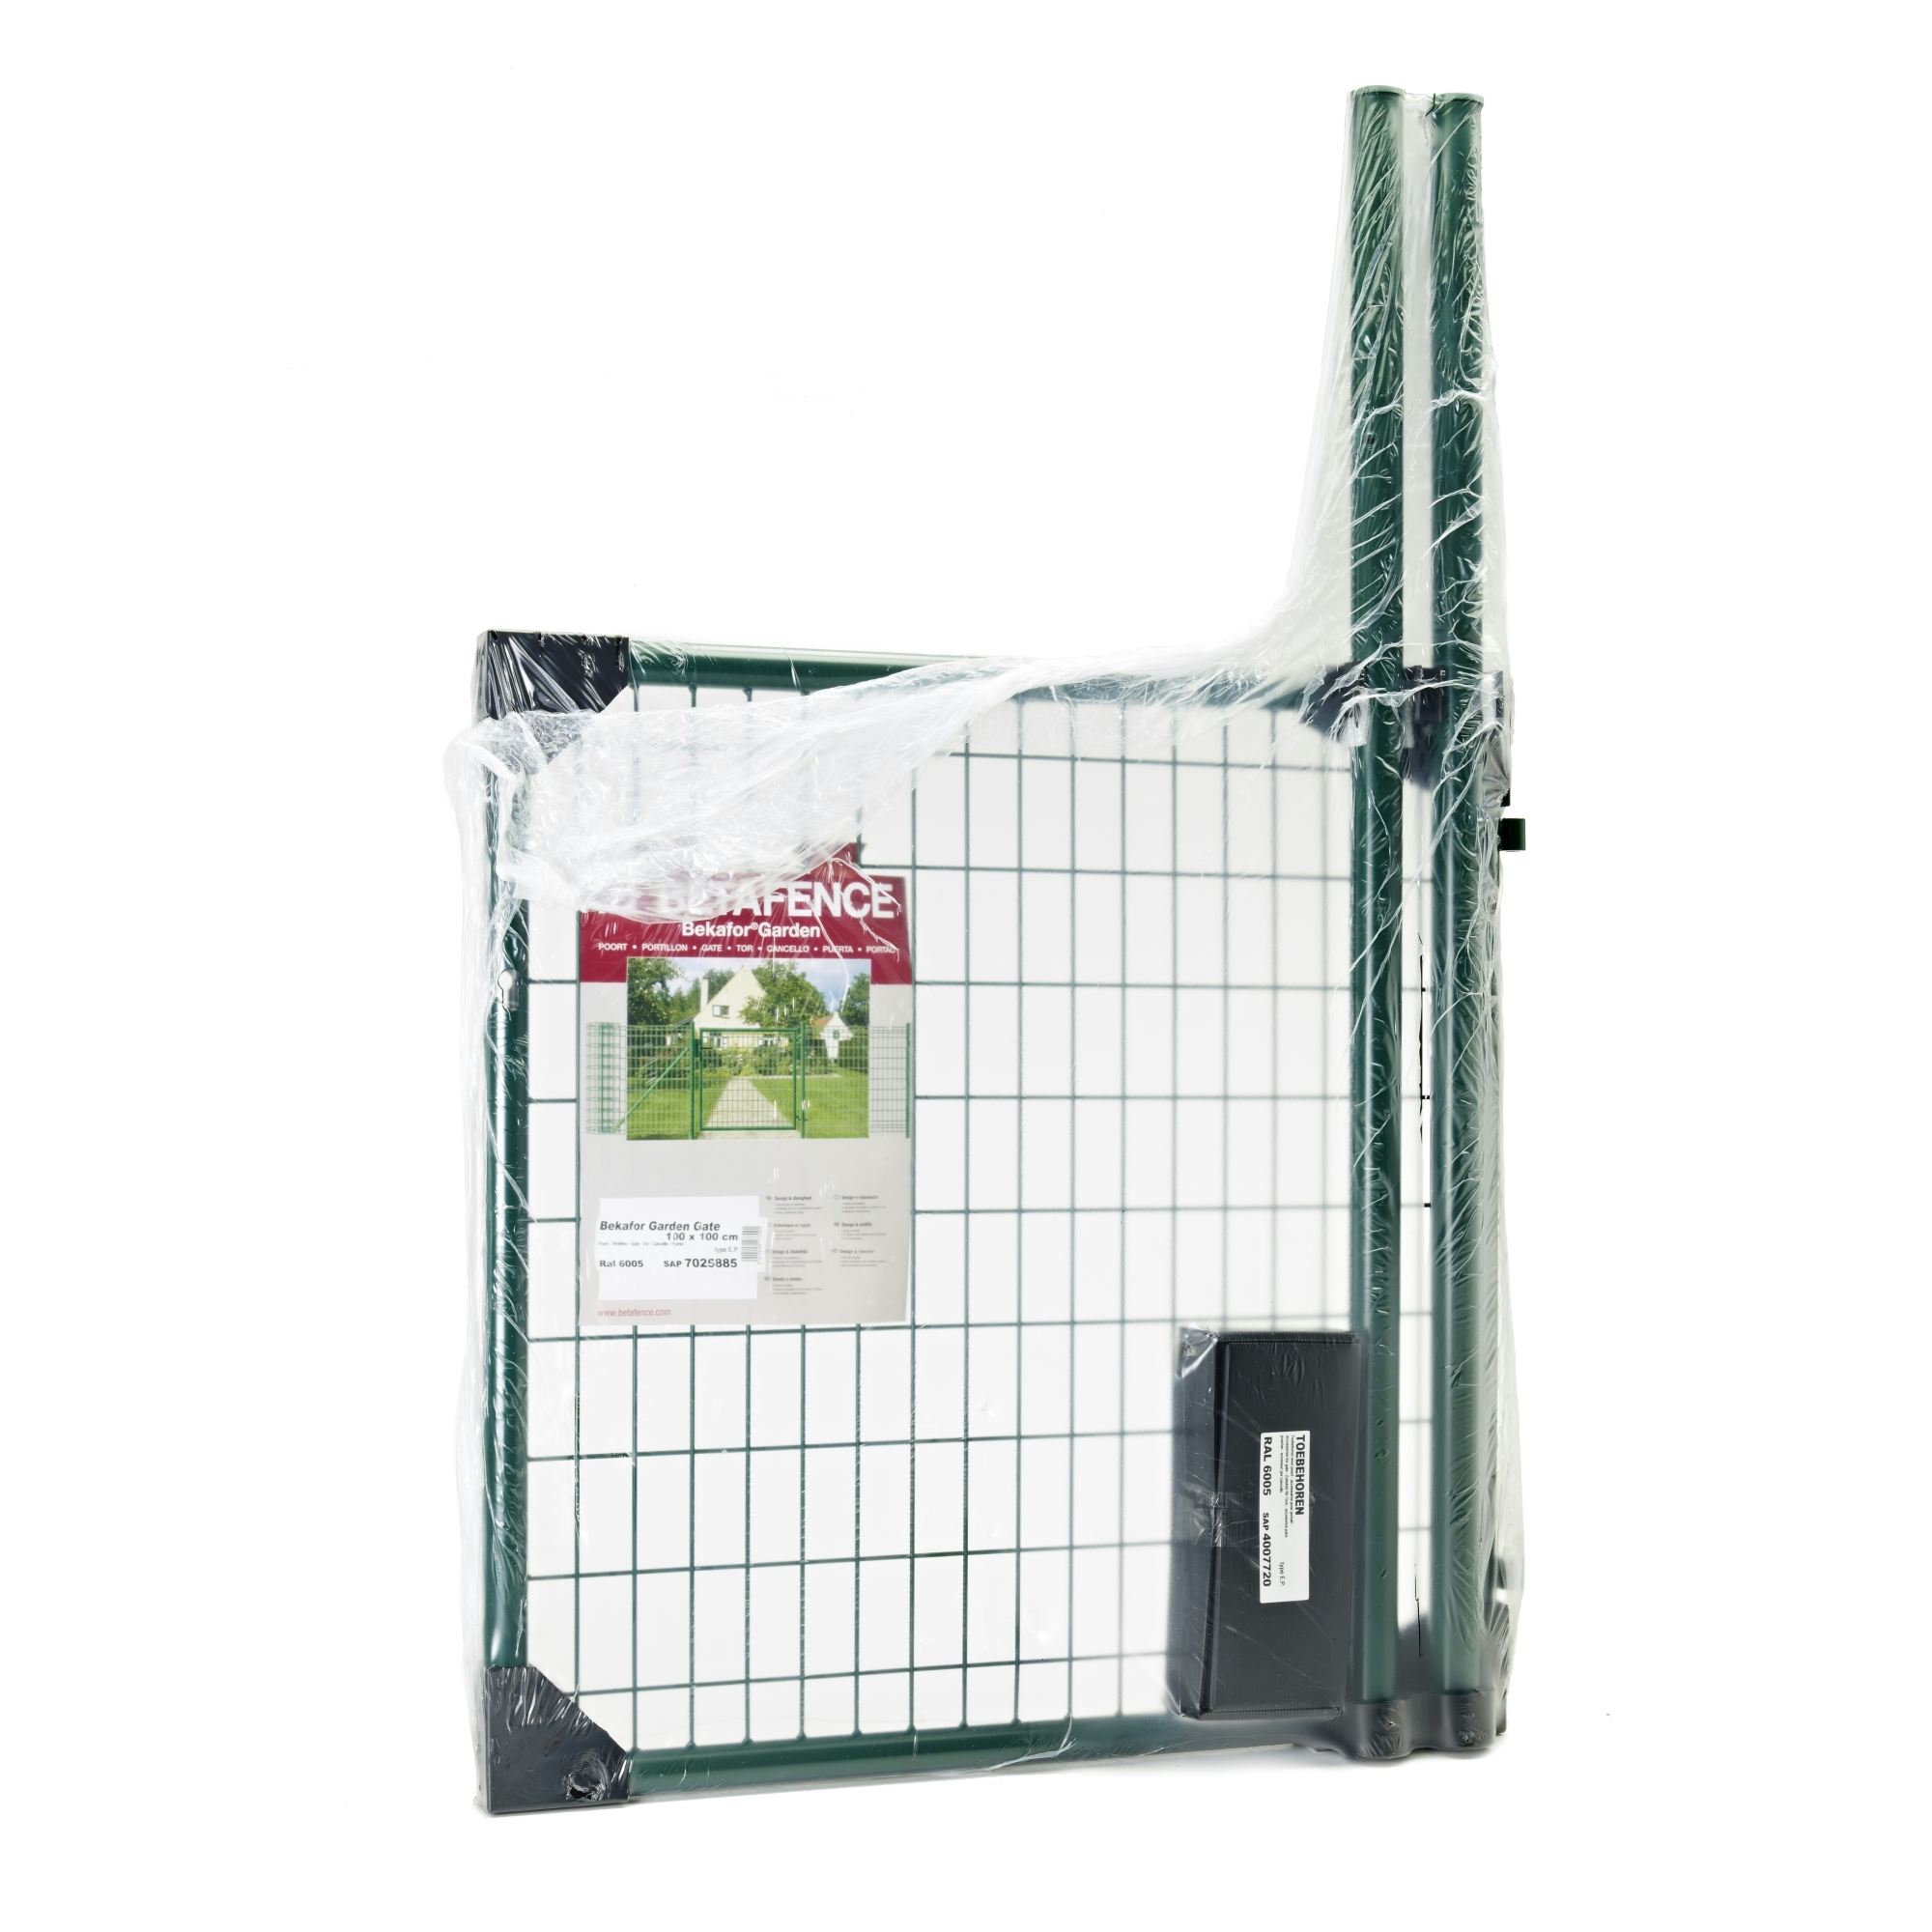 Portillon de jardin bekafor betafence 100x150 cm vert for Portillon de jardin metal vert